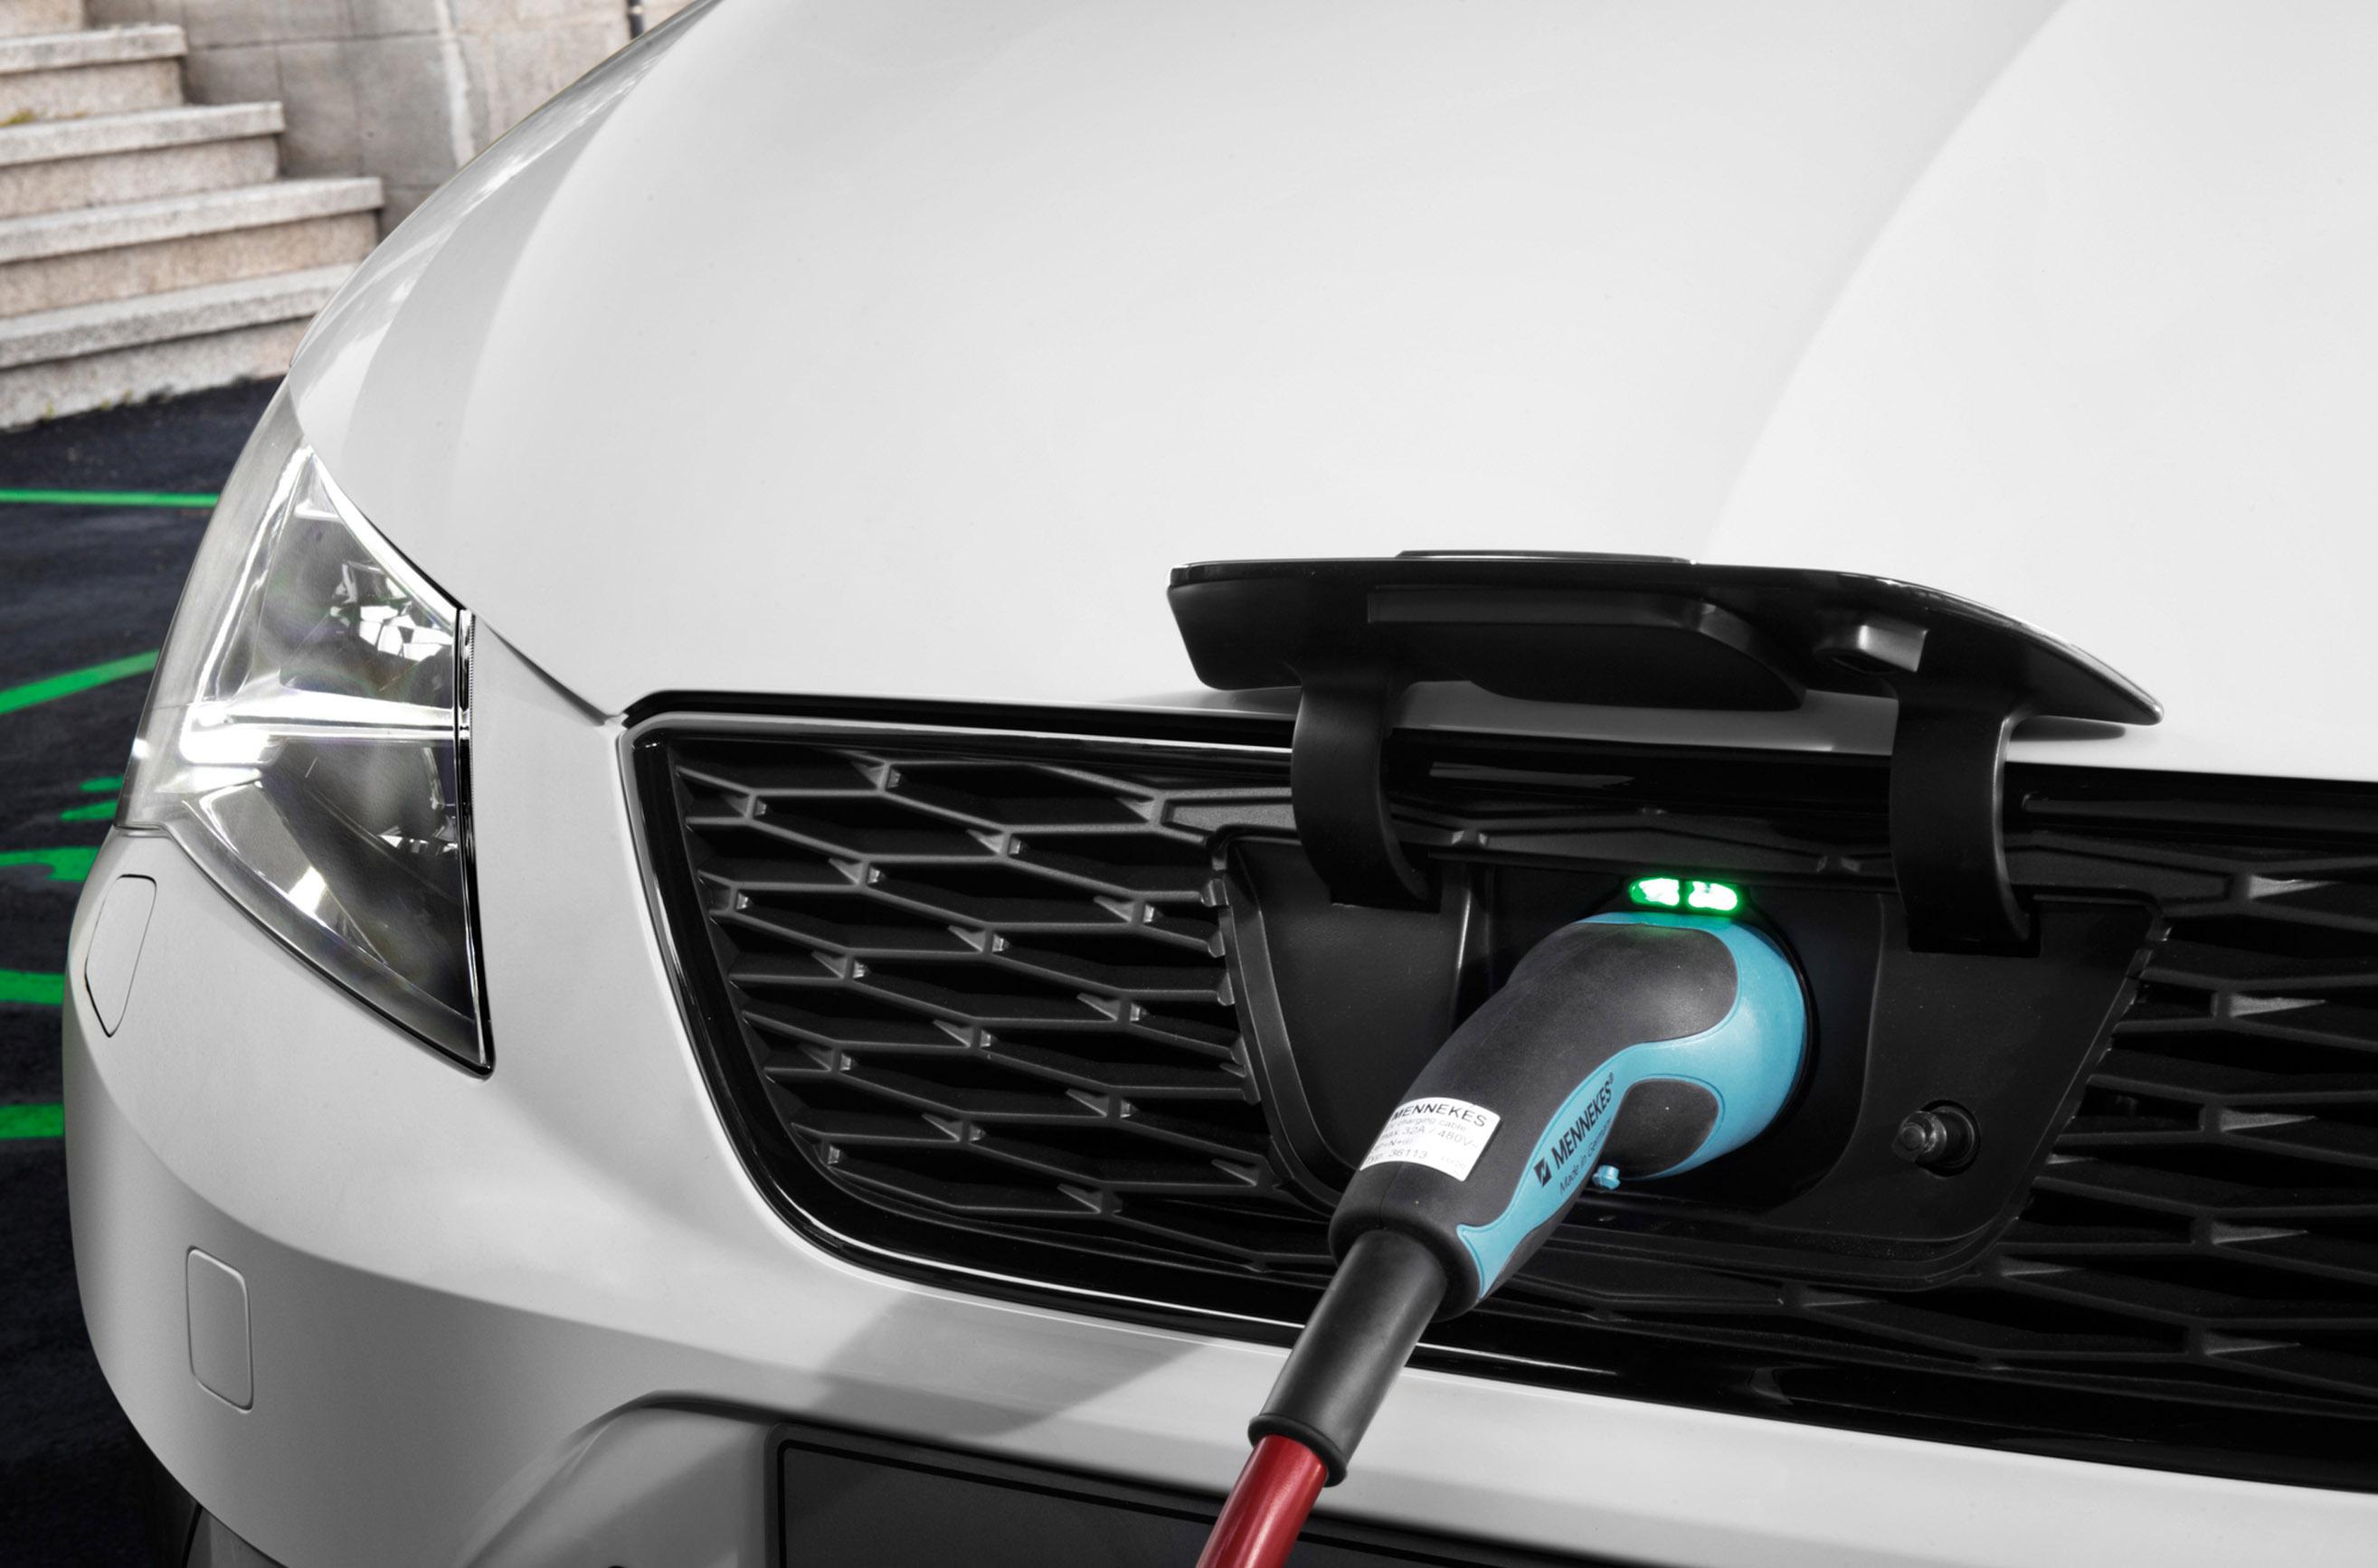 http://www.automobilesreview.com/gallery/seat-leon-verde-hybrid-electric-prototype/seat-leon-verde-hybrid-electric-prototype-03.jpg